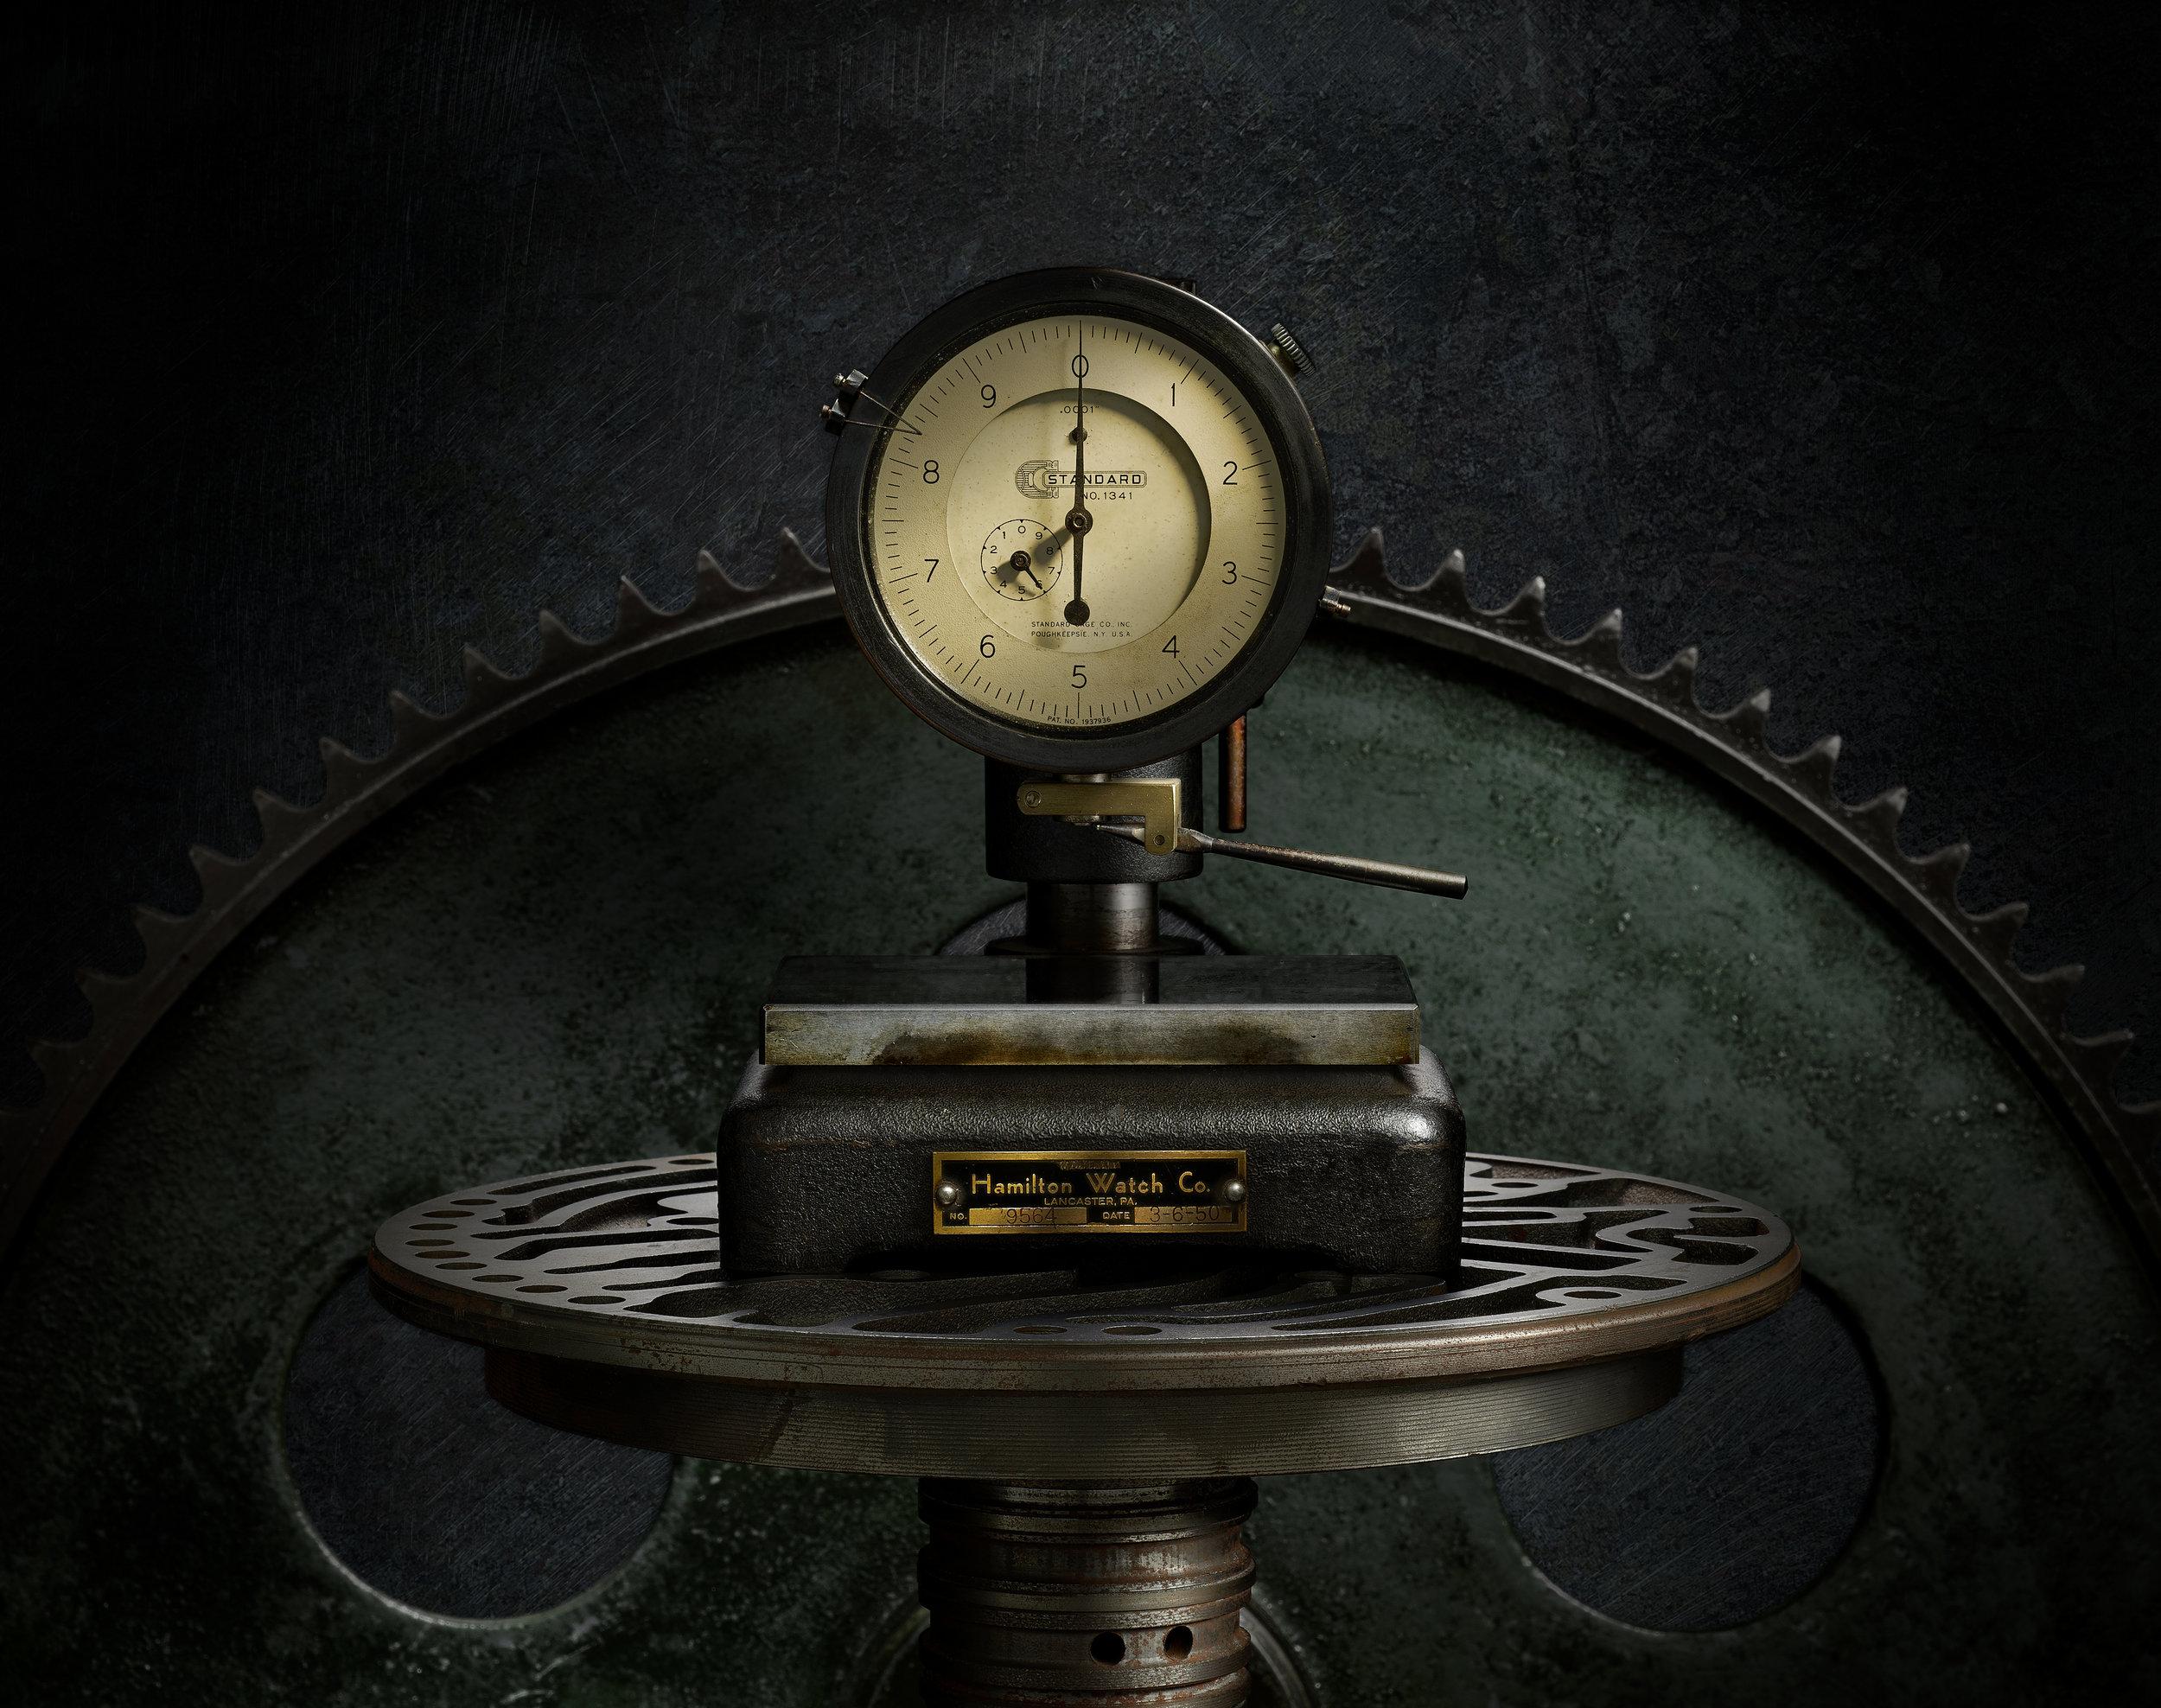 Hamilton Watch Dial Indicator (Copyright 2018, Jason Nicholas)